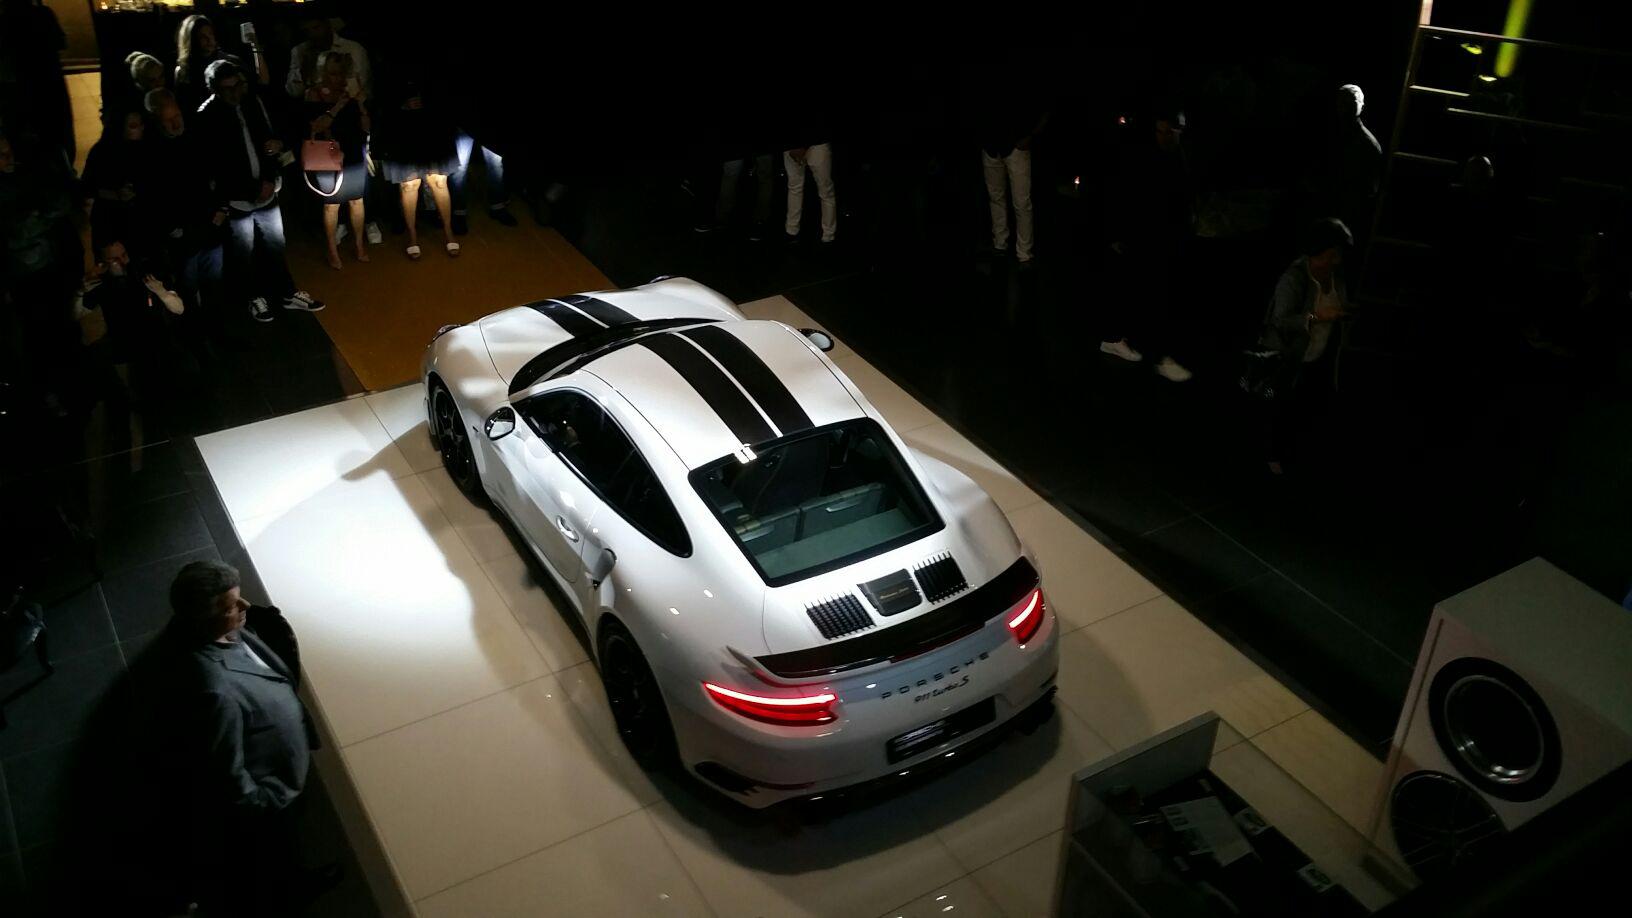 AUCOP-EVENT-PORSCHE-ANTIBES-2017-Porsche 911 Turbo S